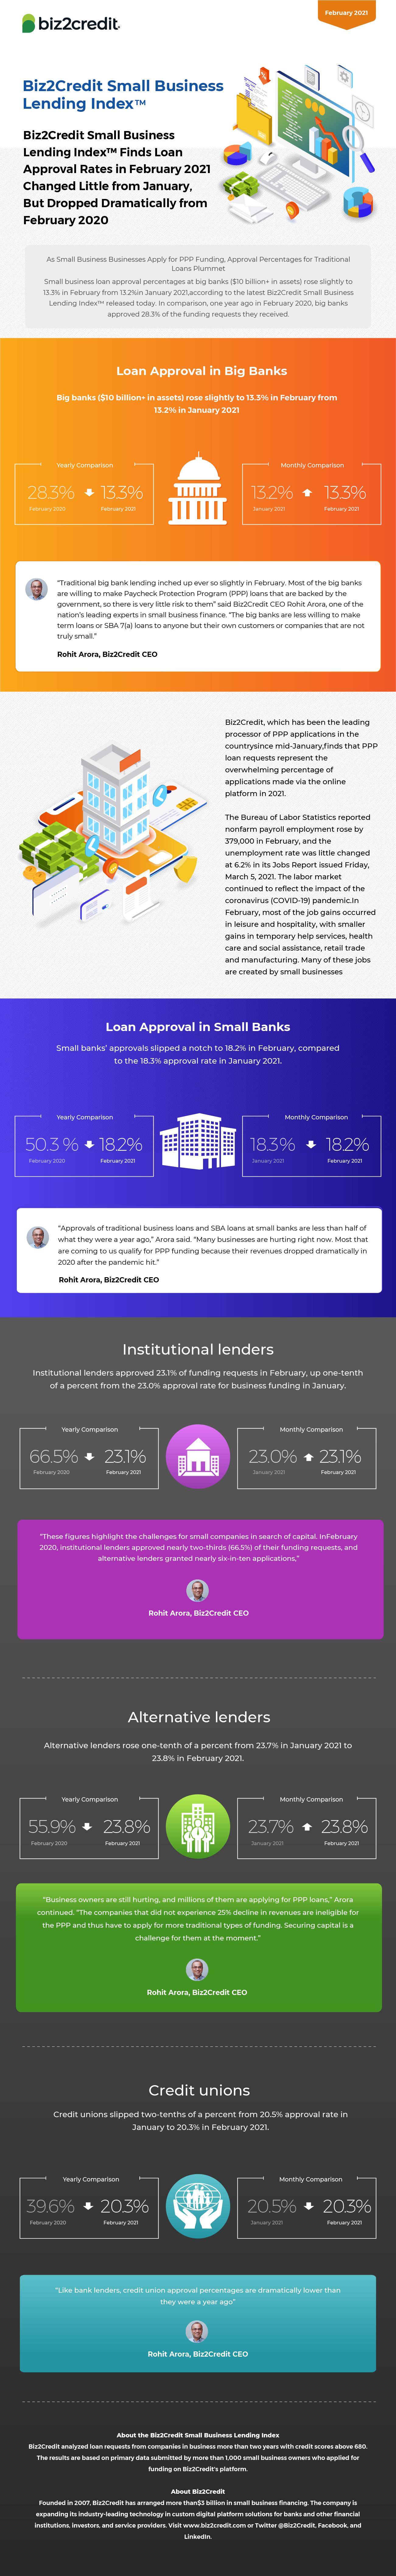 February 2021 Lending Index Infographic